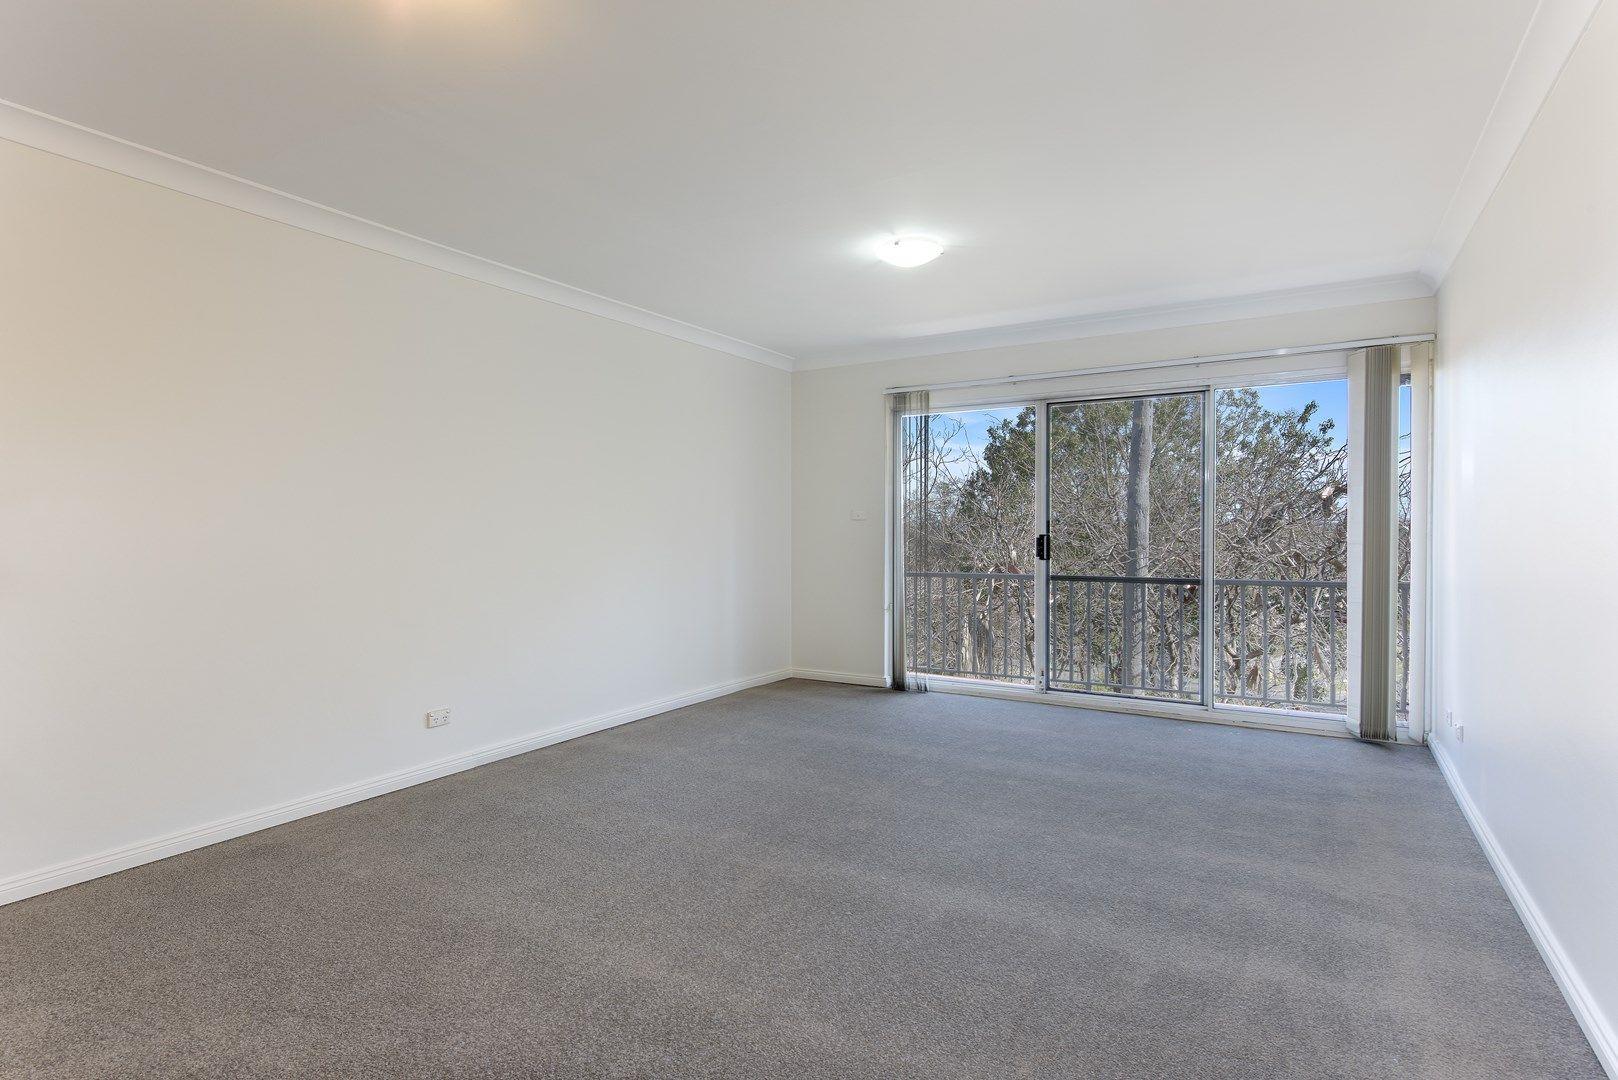 11/15 Wharf  Road, Gladesville NSW 2111, Image 0